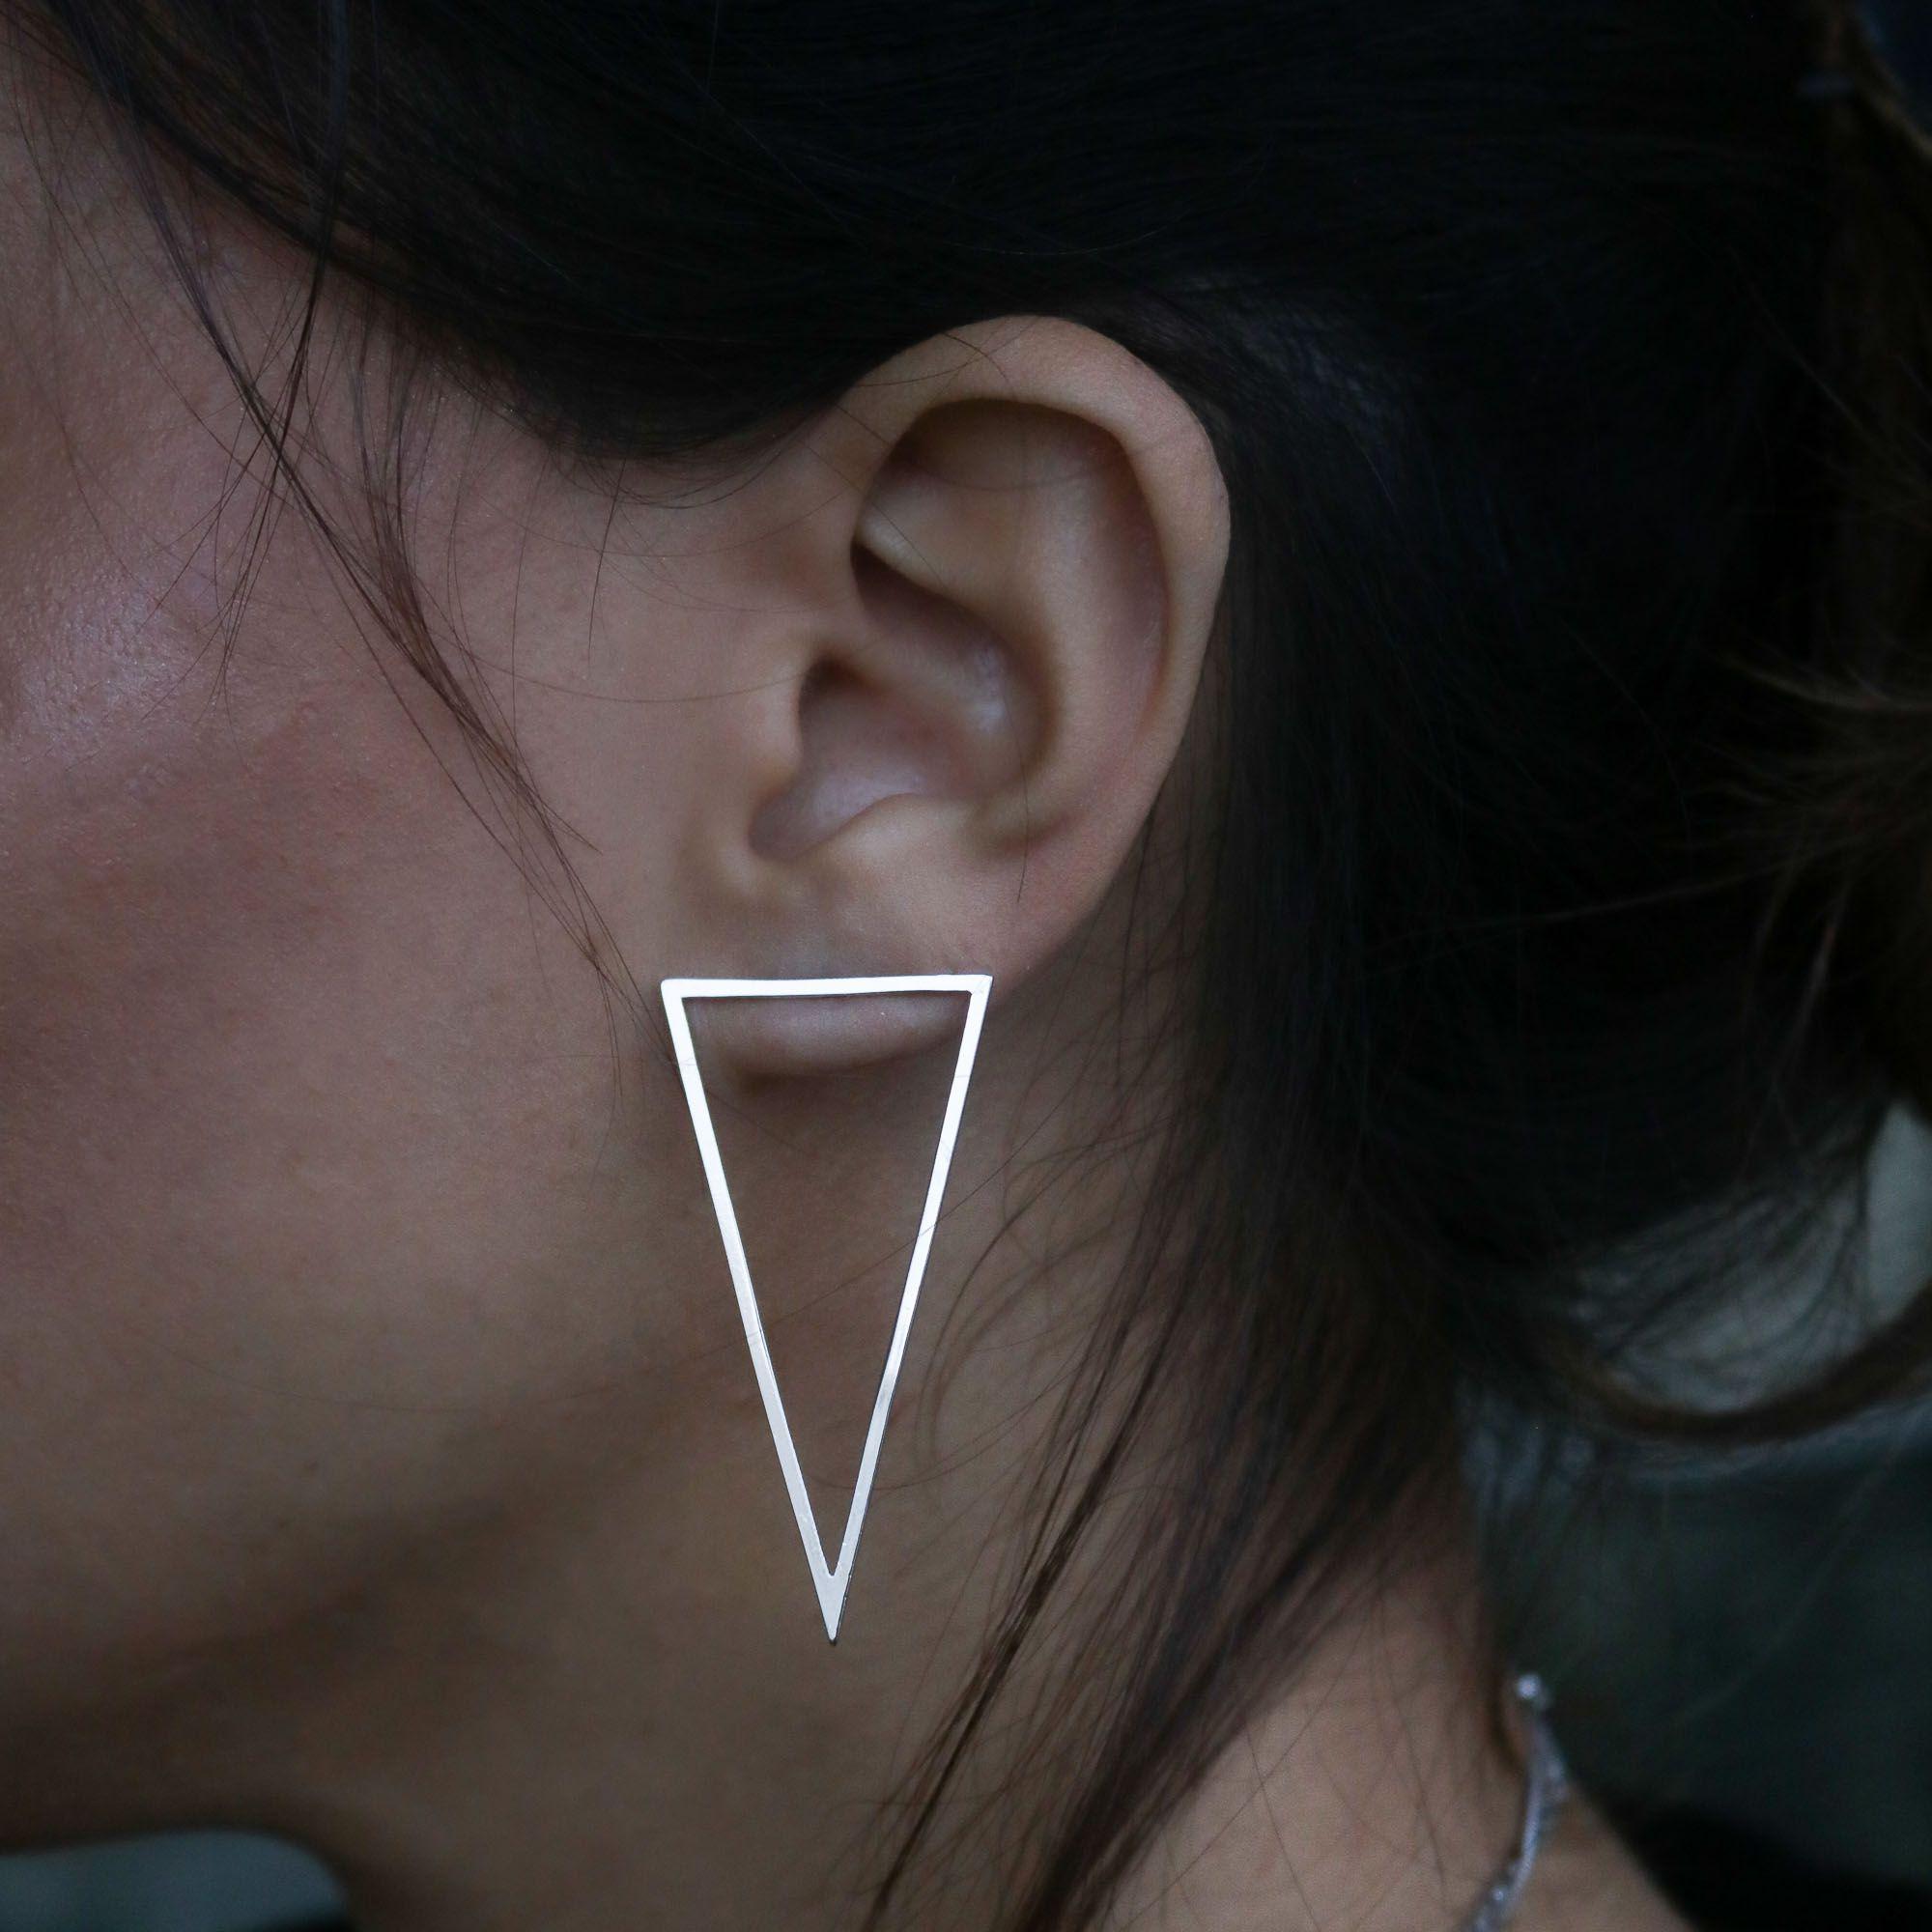 Brinco Semi joia triângulo vazado estilo minimalista  a ouro 18k ou rhodium